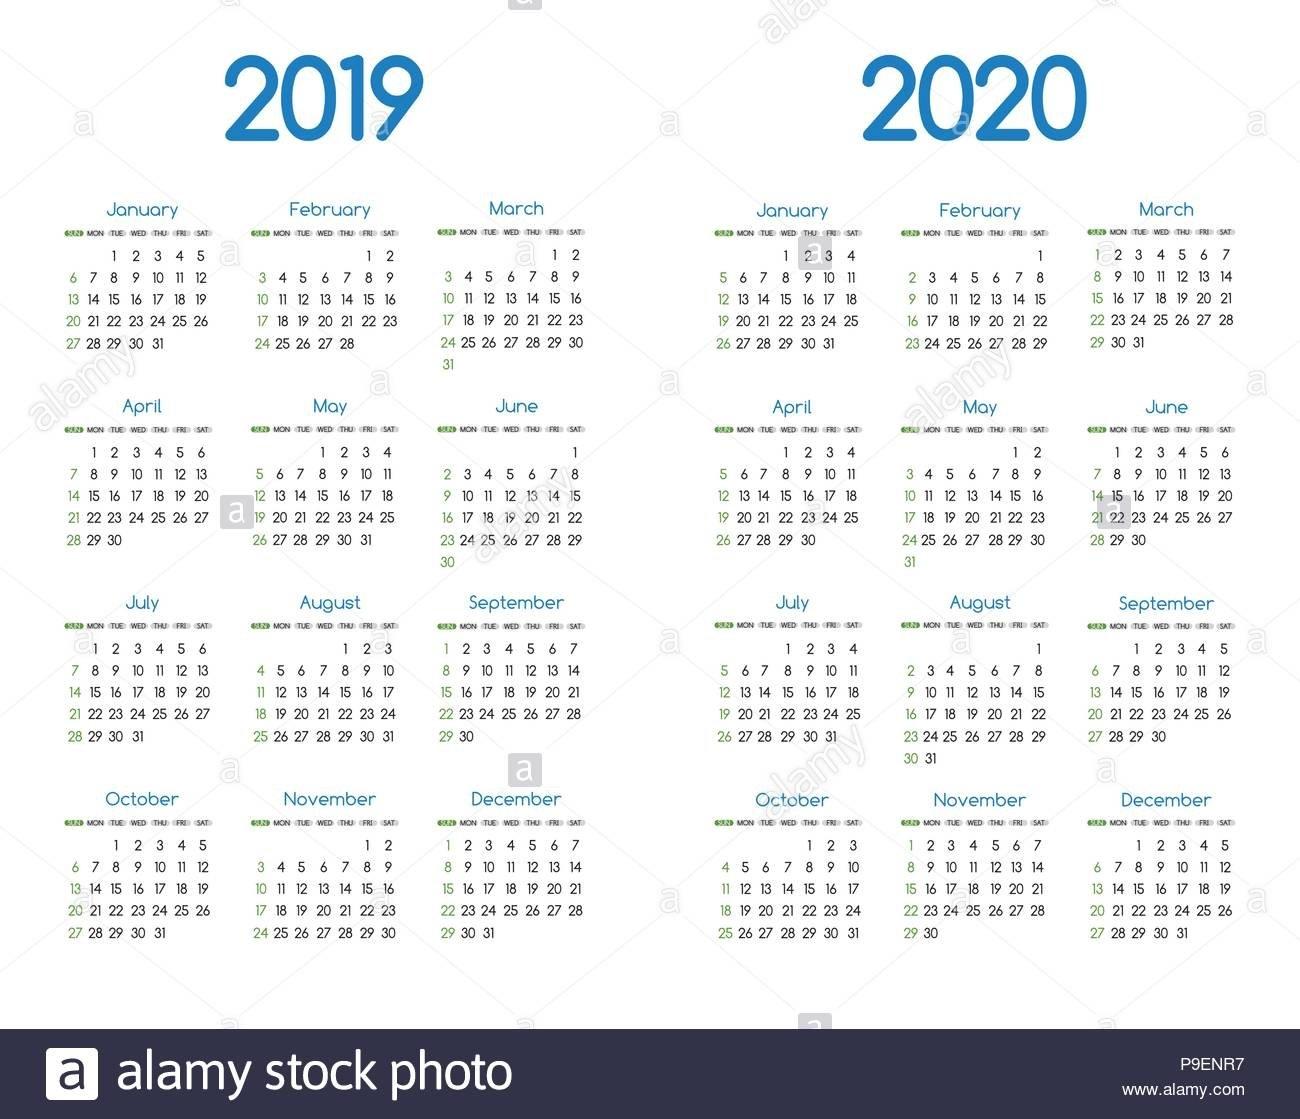 Simple 2020 Year Calendar Stockfotos & Simple 2020 Year Calendar Calendar 2019 Neu